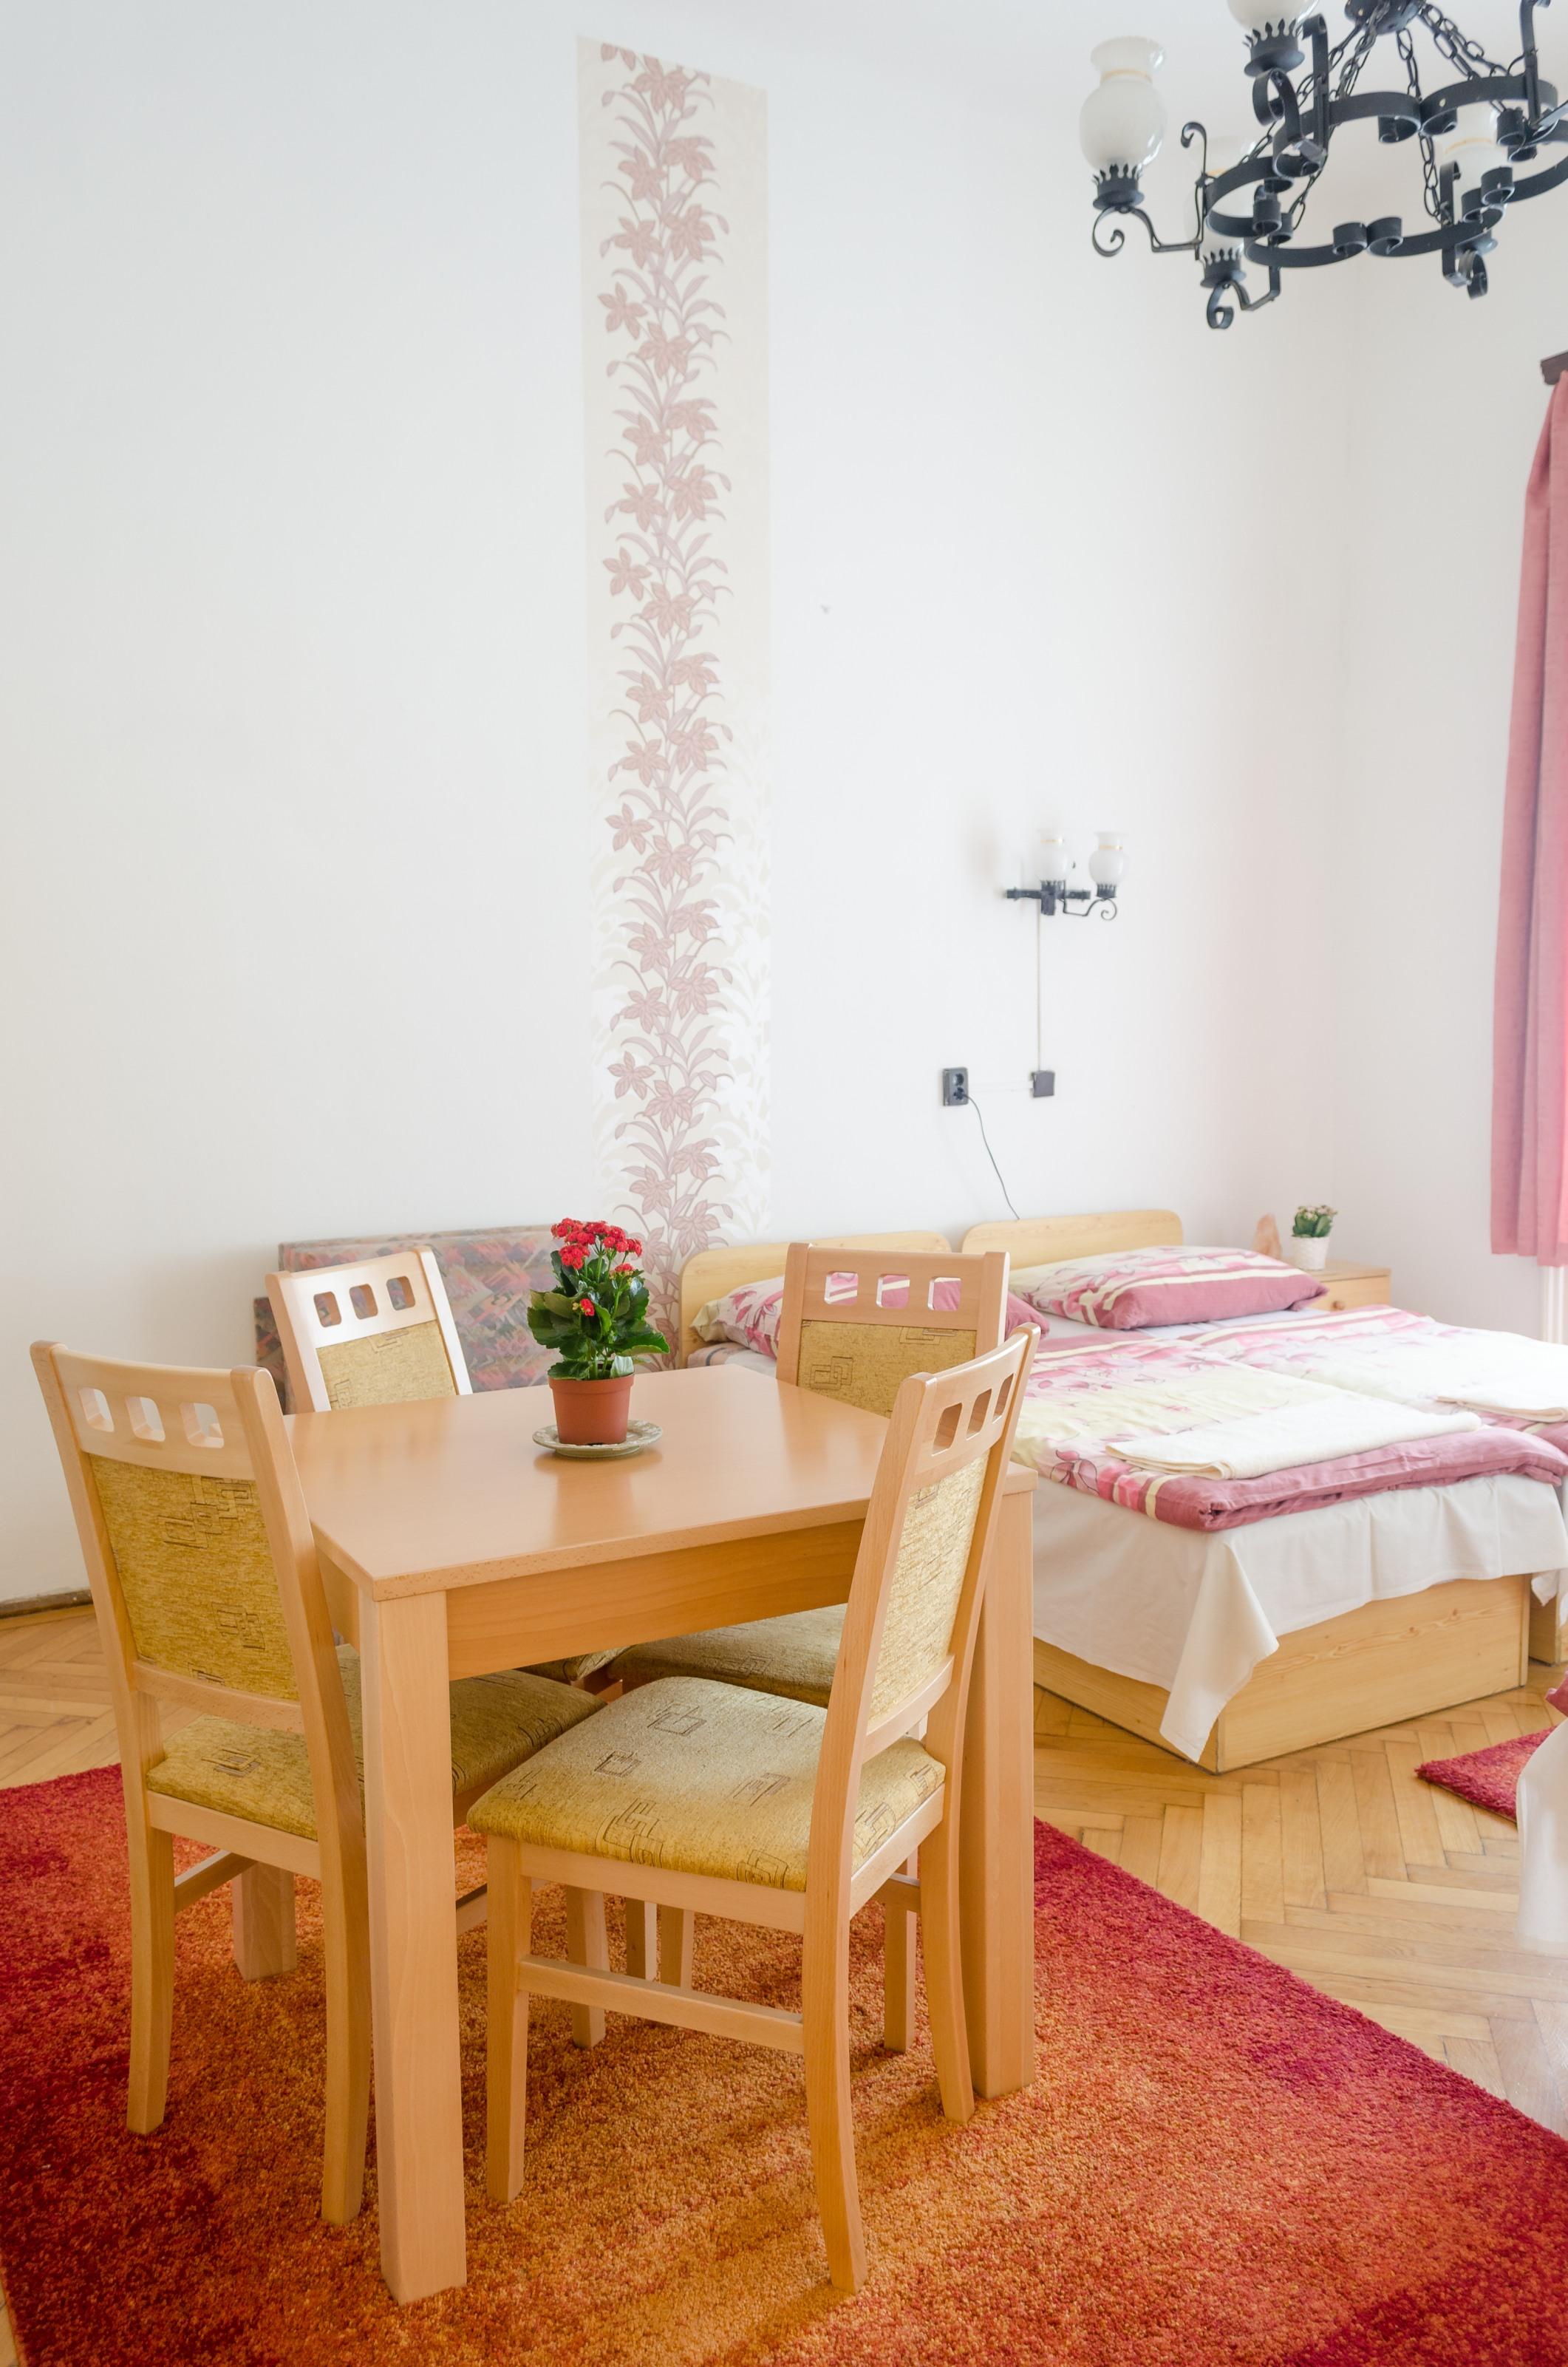 Objectif Zero Dechet Salle De Bain ~ h bergement logement a budapest appart hotel liste description